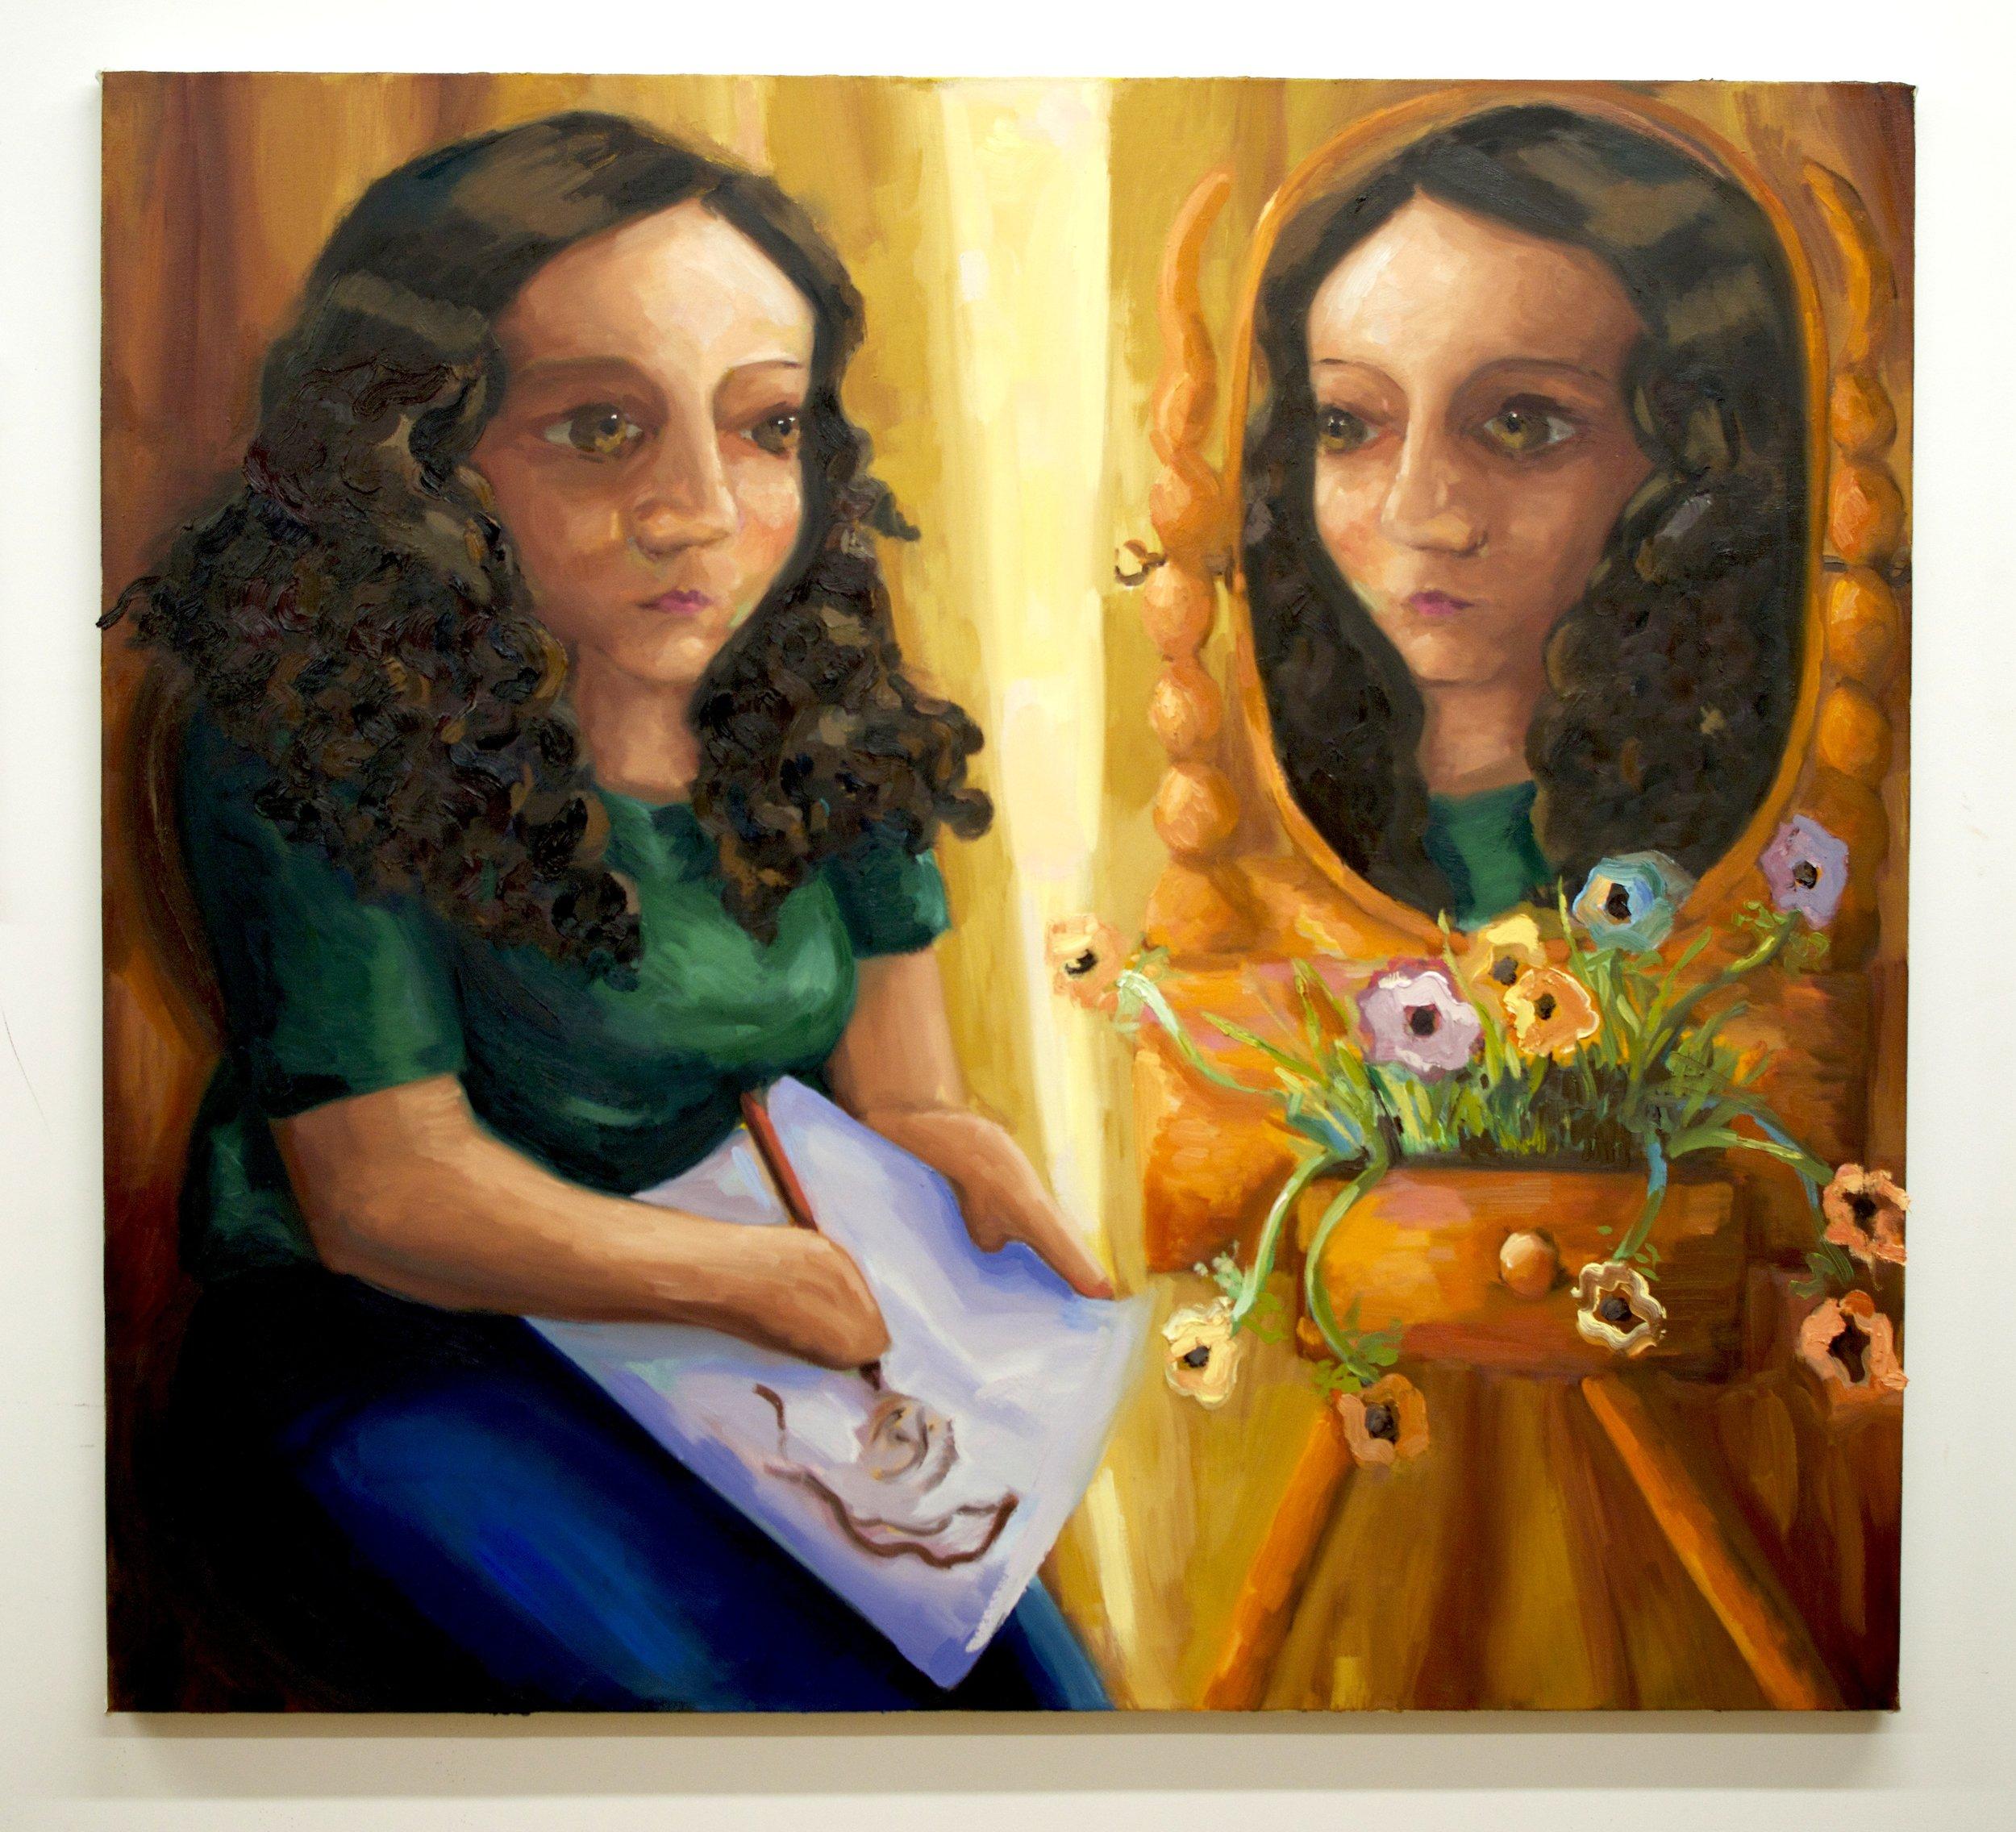 Curtain (Self-Portrait).jpg